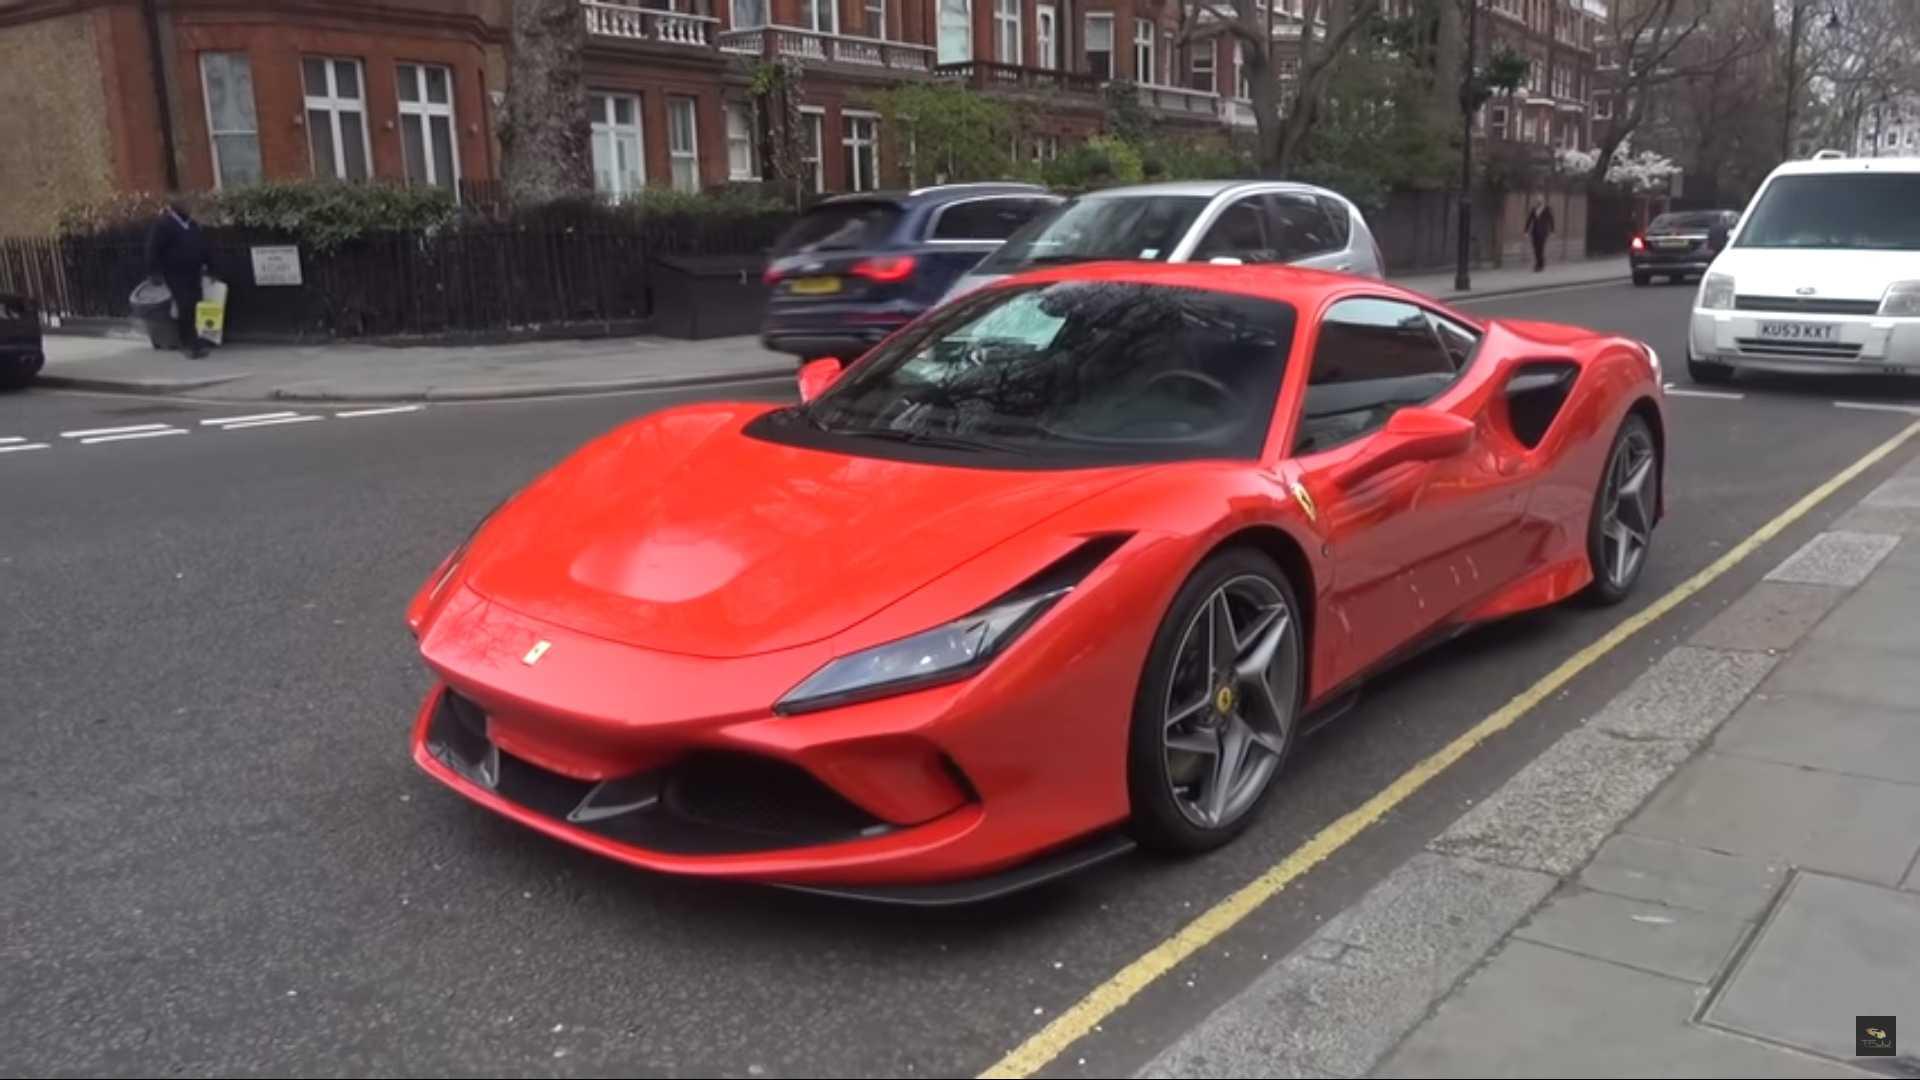 Aí está ele: O Ferrari F8 Tributo já anda na rua